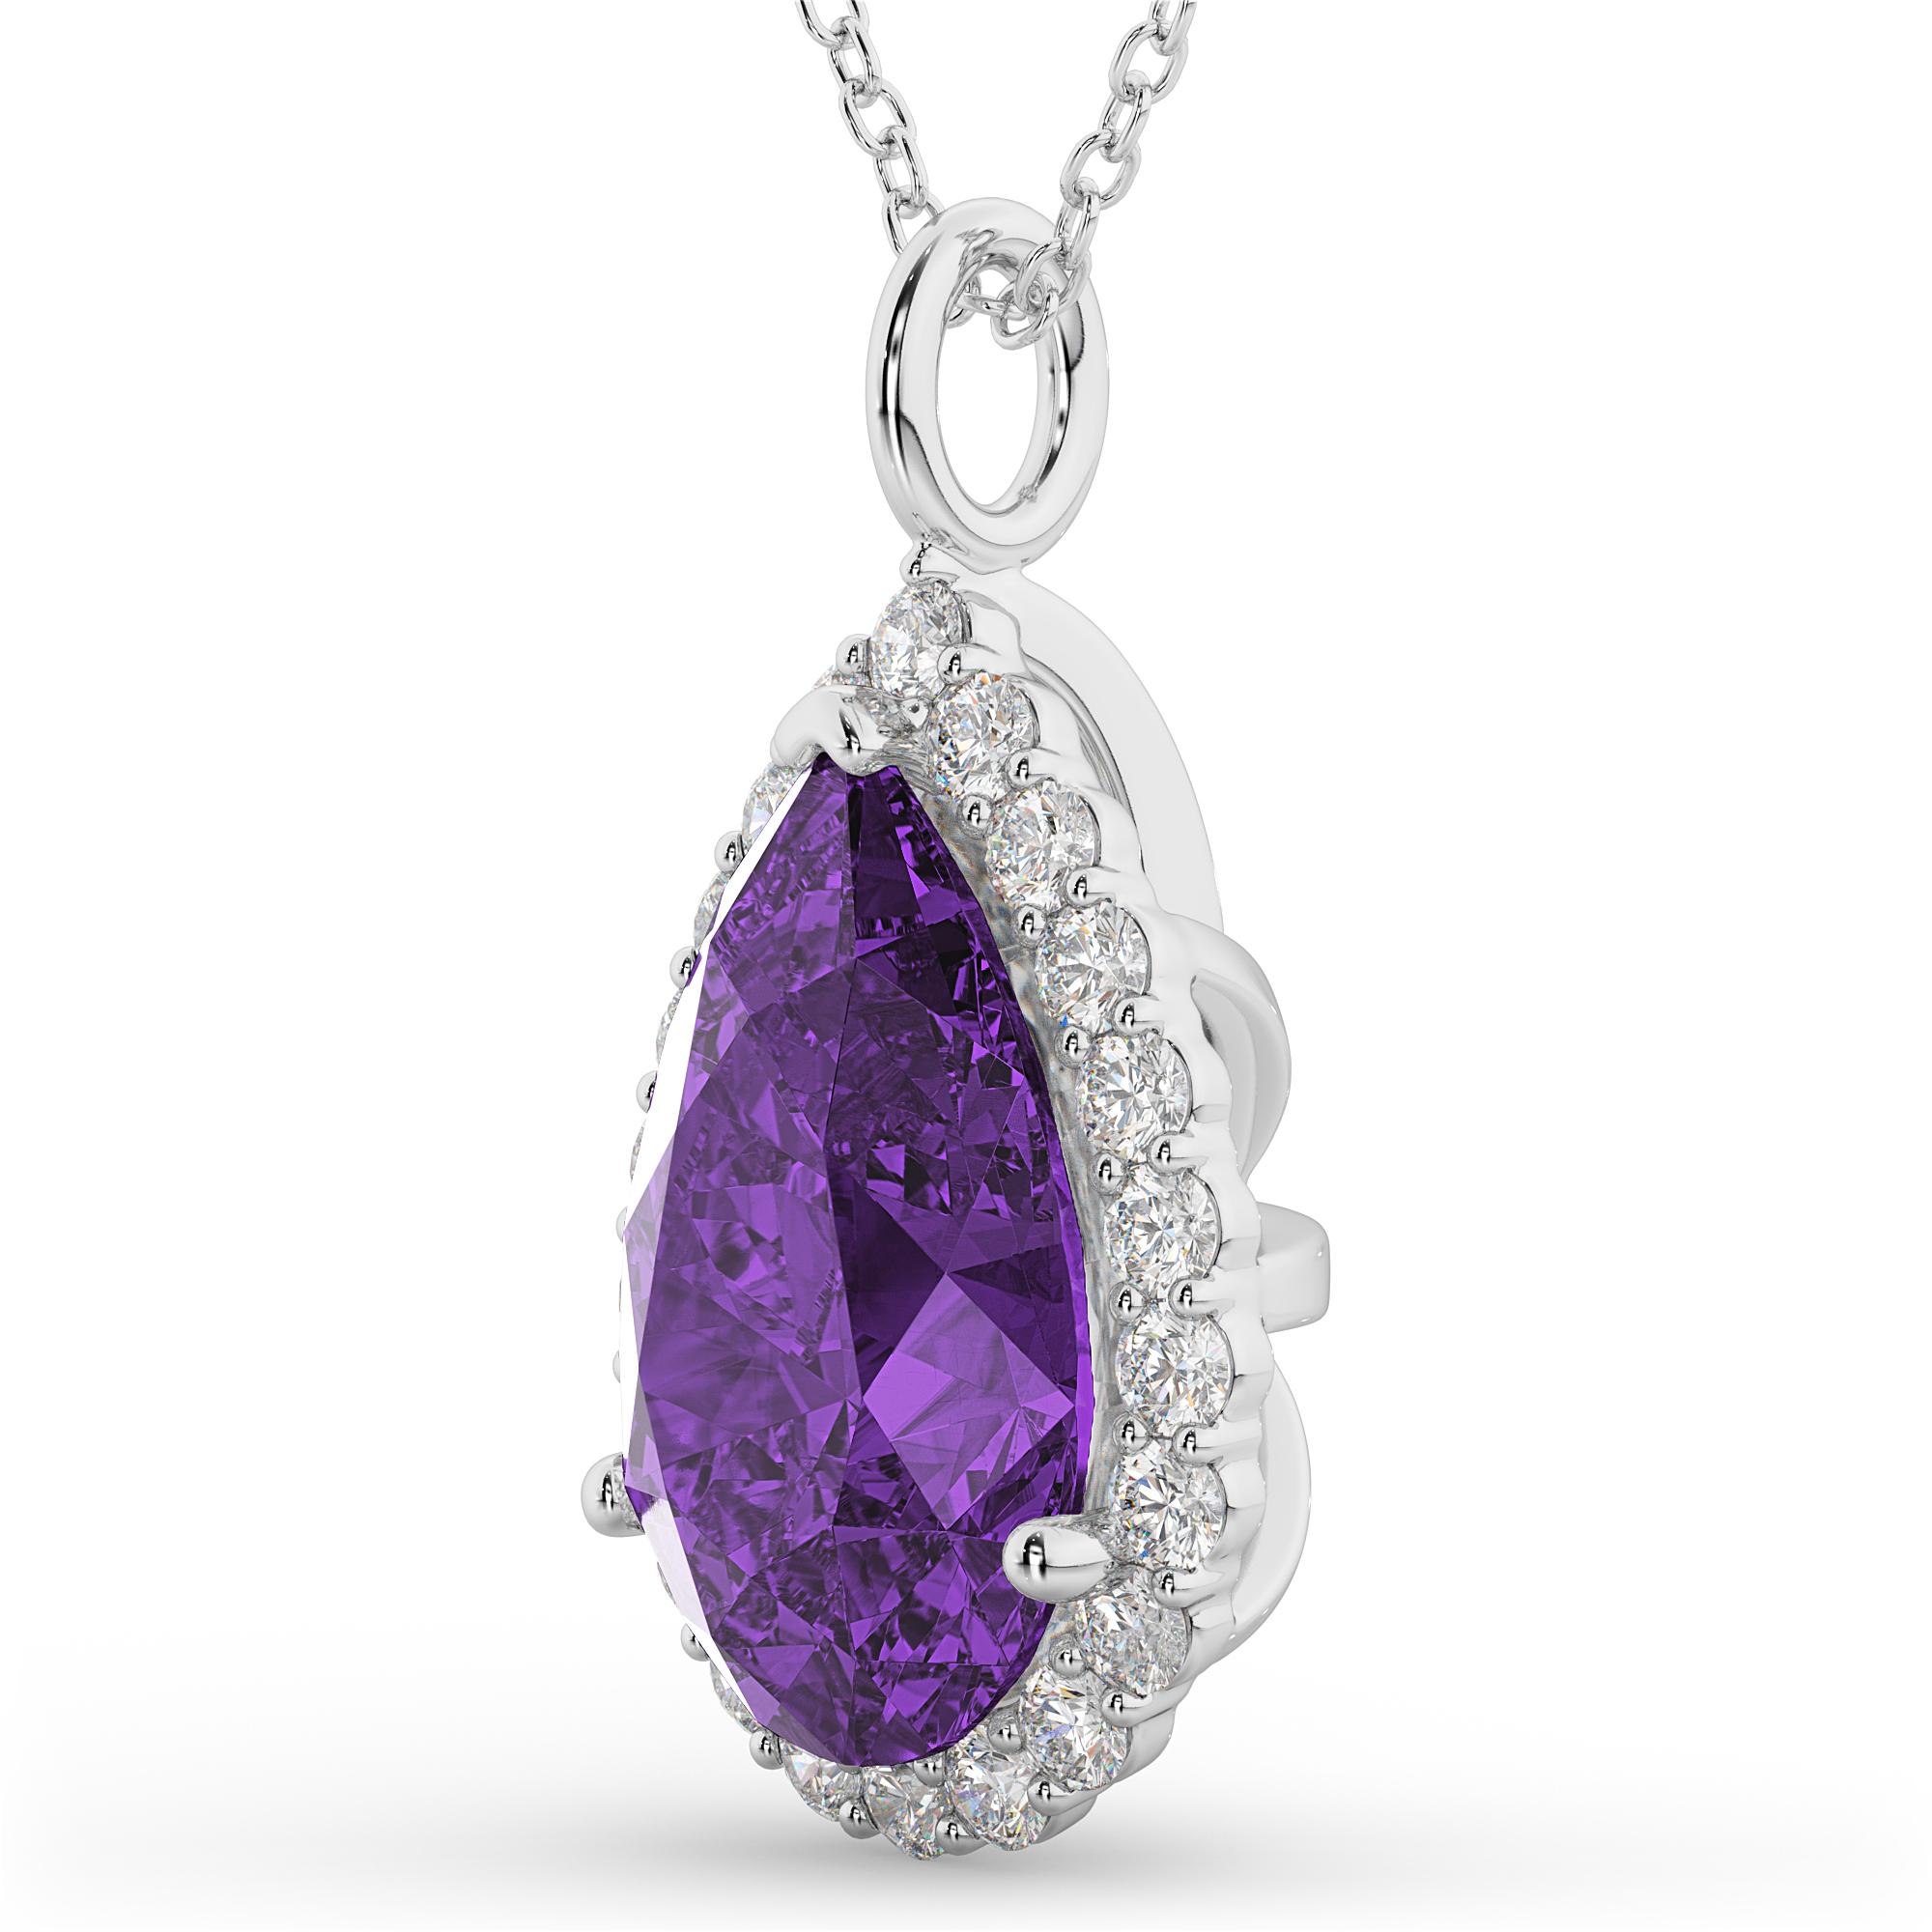 Halo Amethyst Amp Diamond Pear Shaped Pendant Necklace 14k